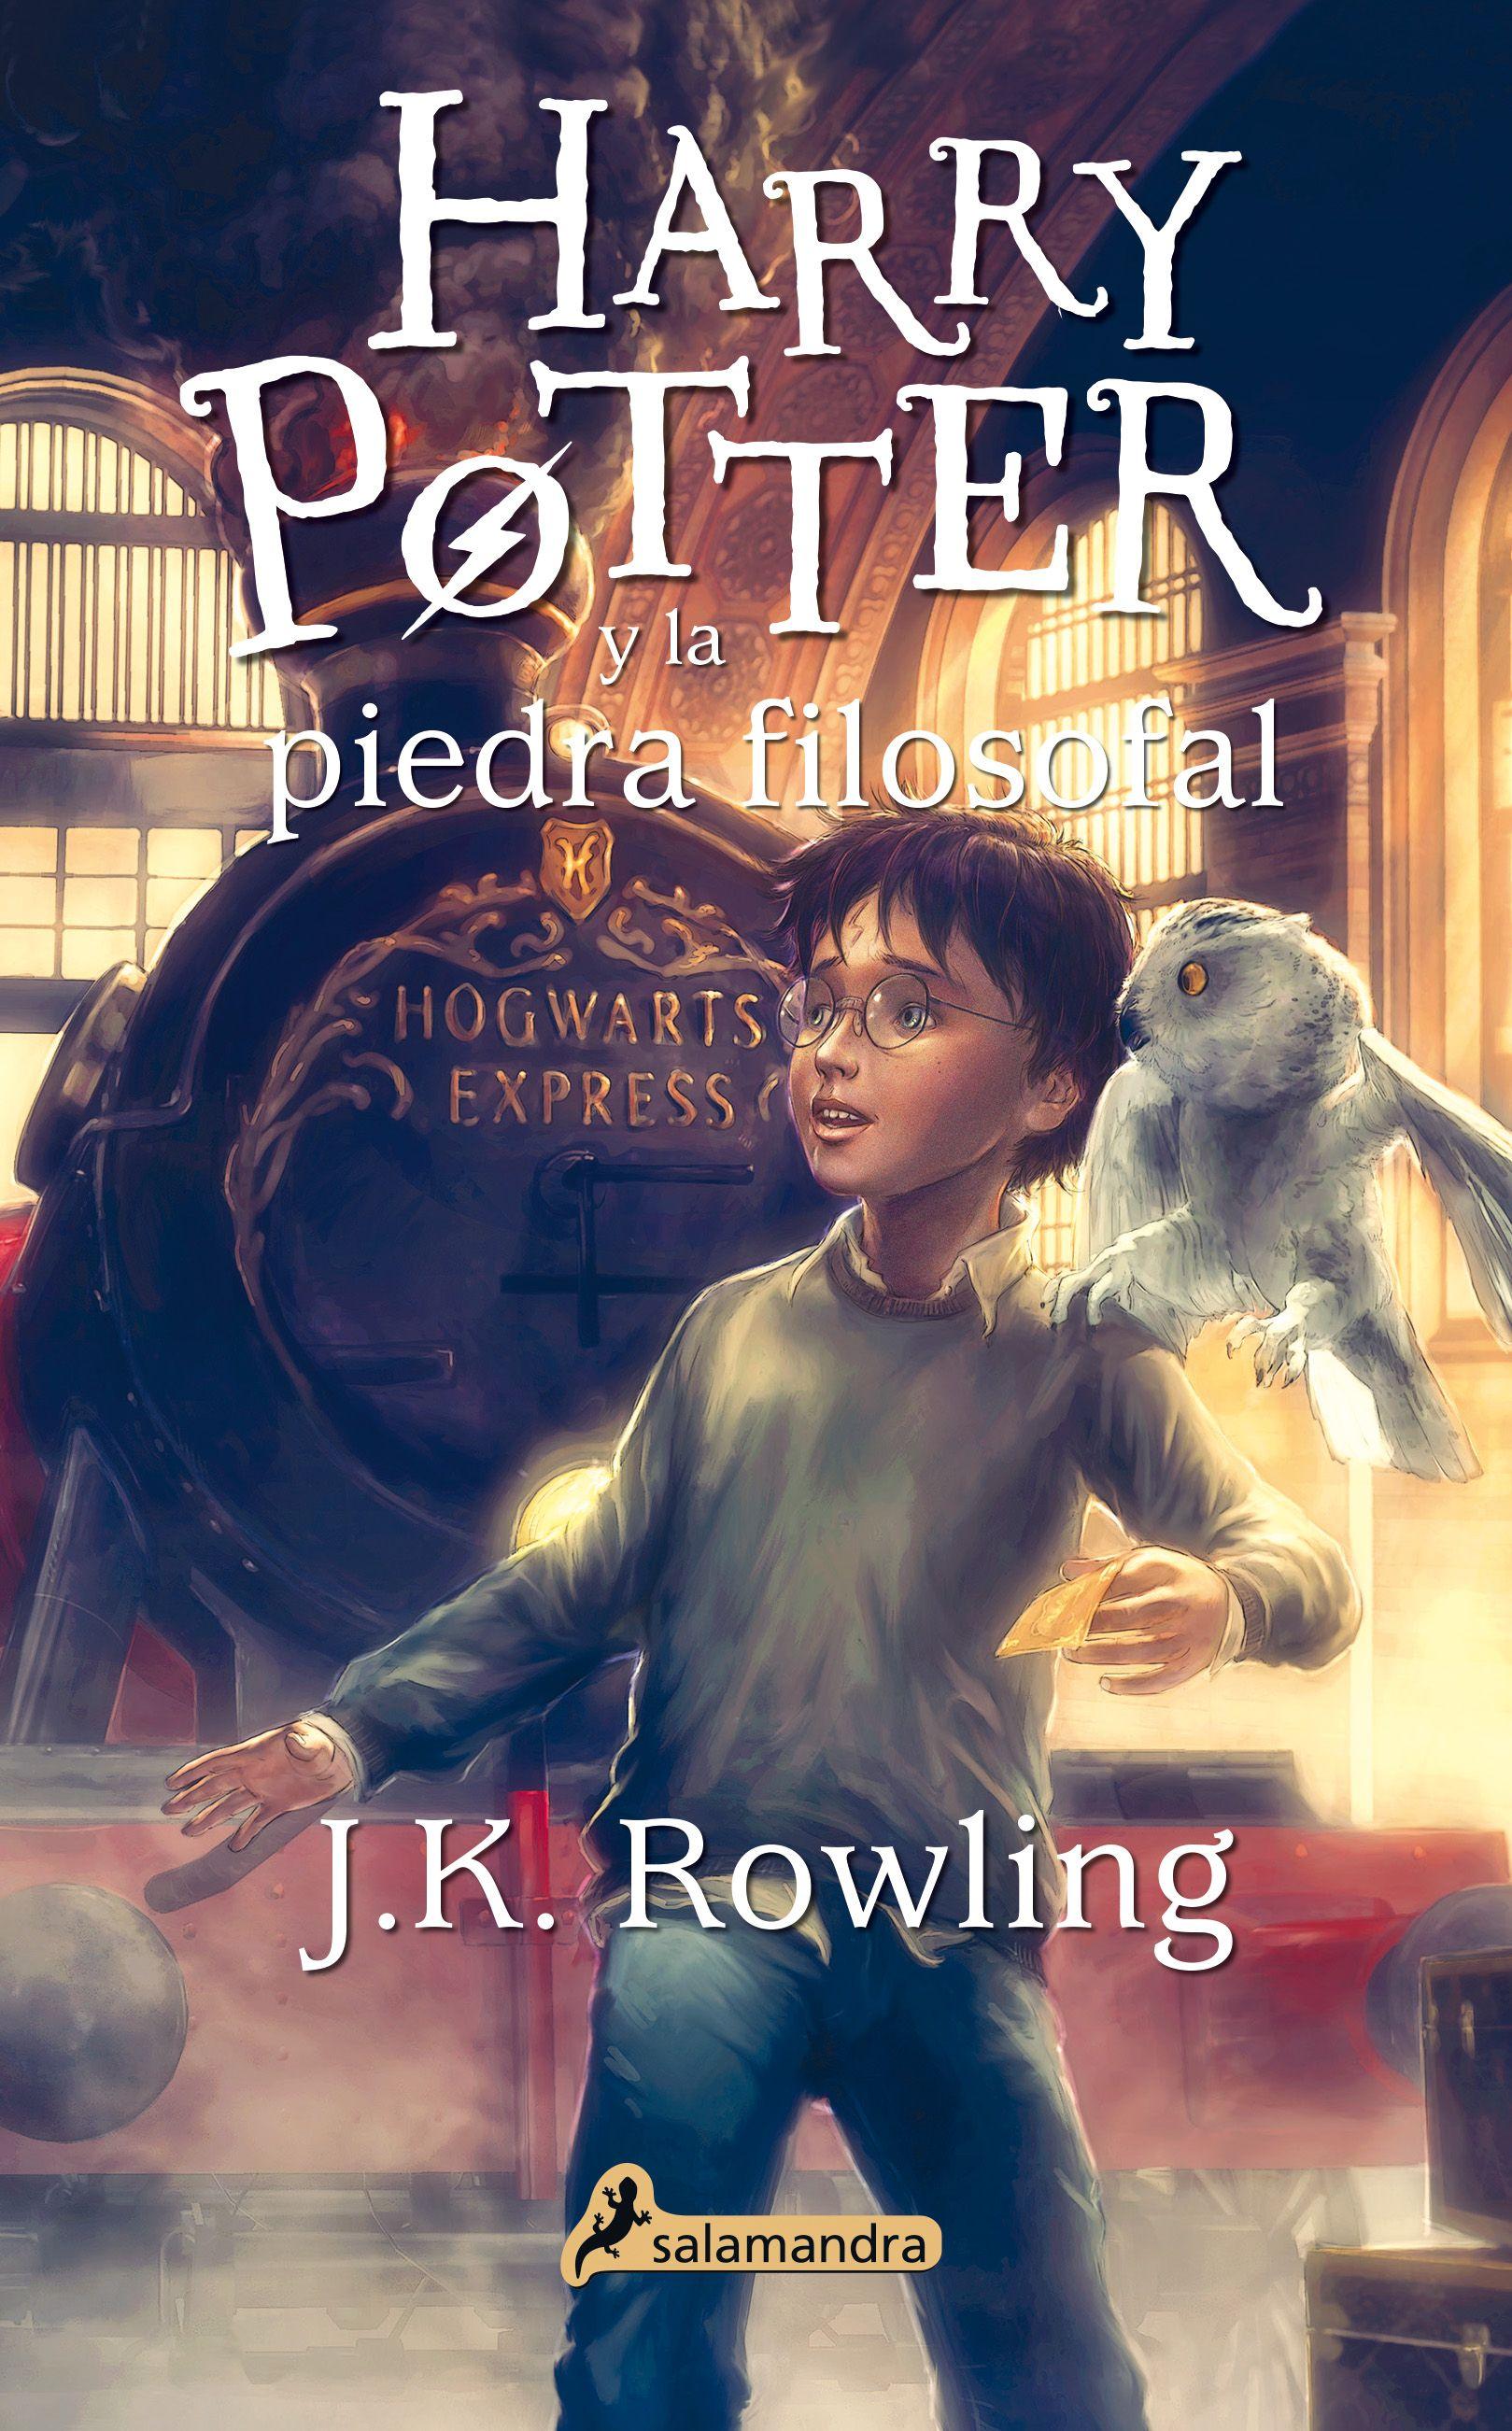 Harry Potter Y La Piedra Filosofal I J K Rowling I Salamandra